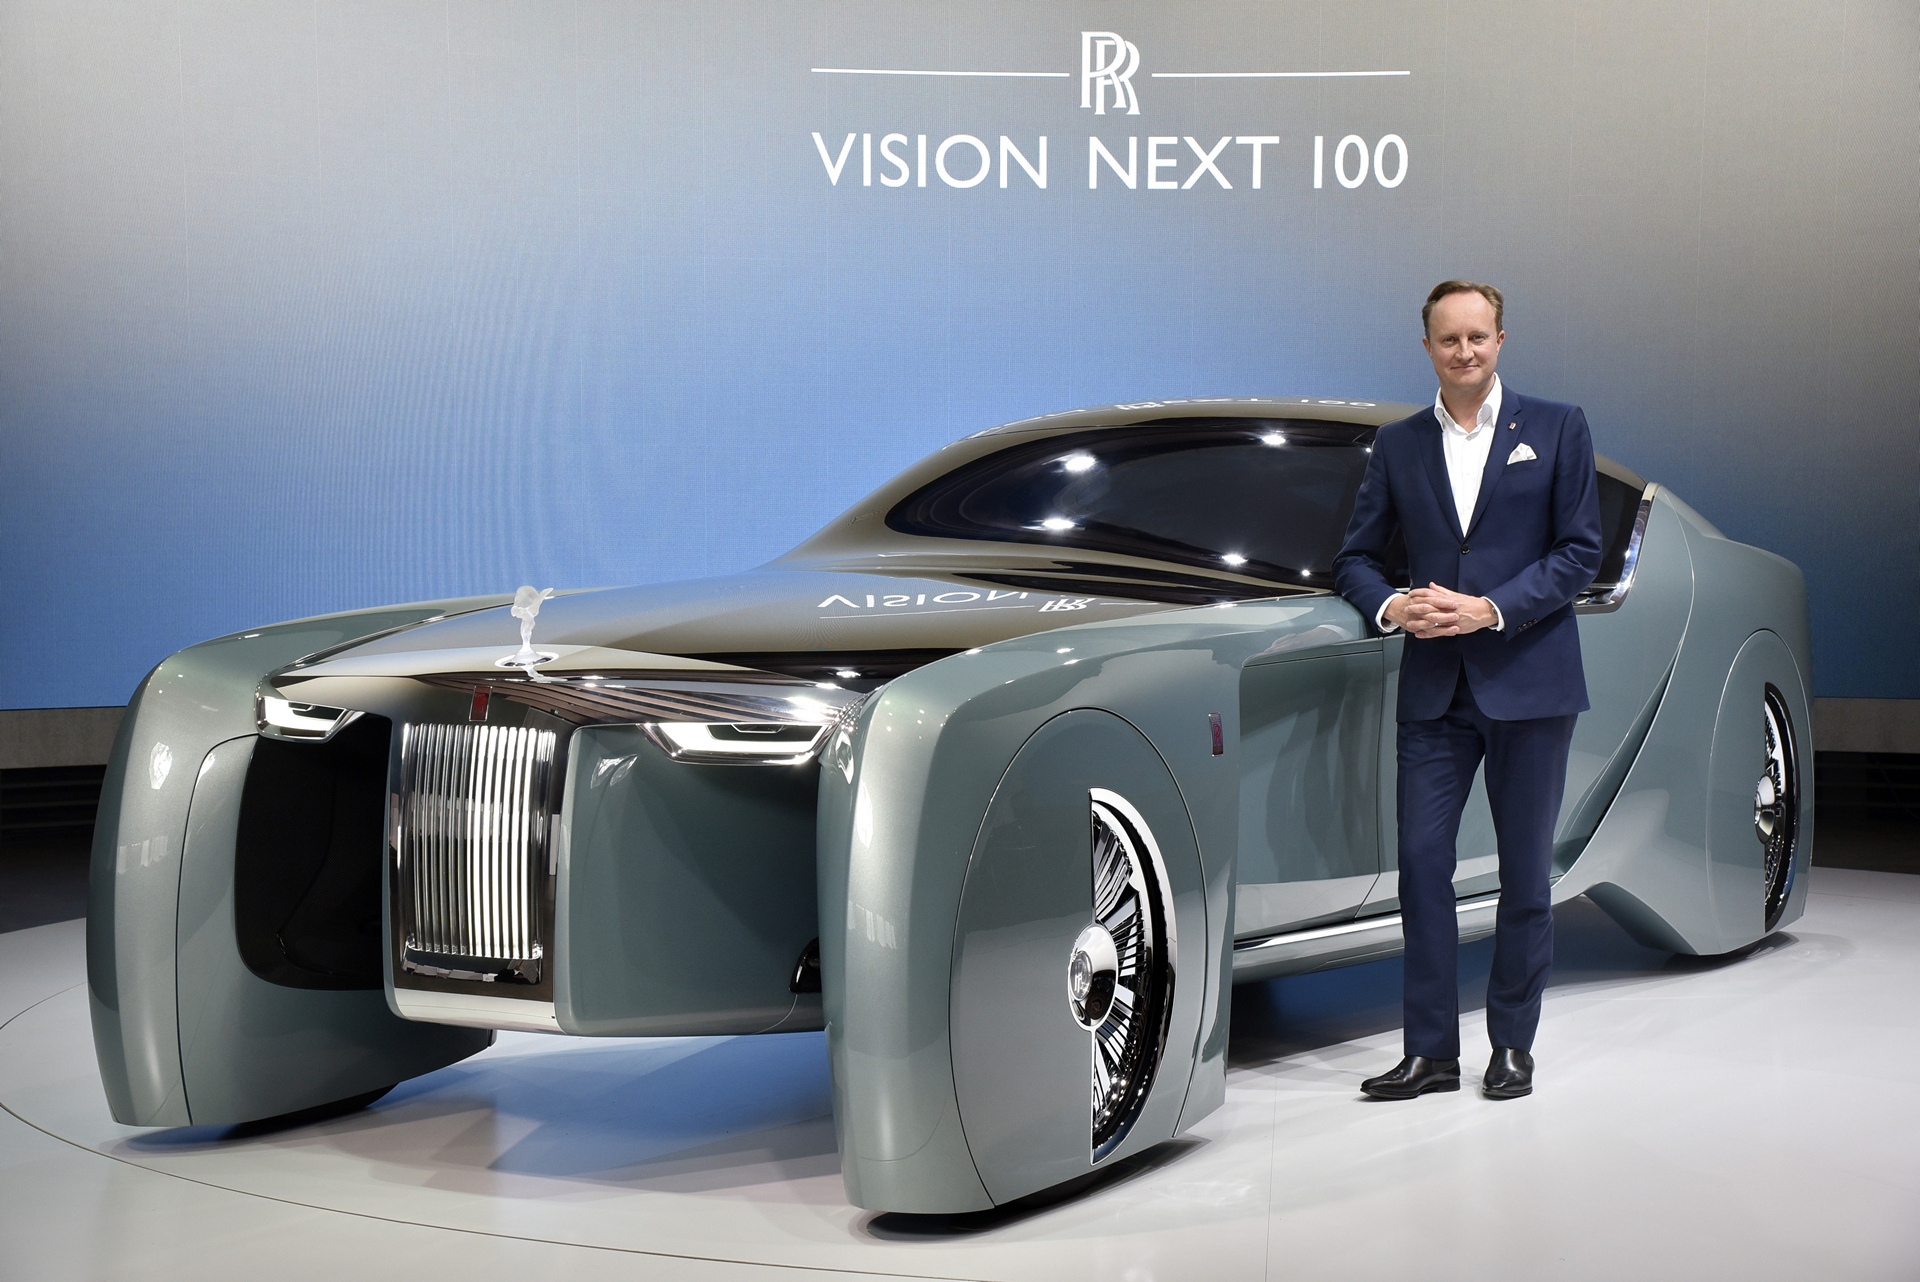 Rolls Royce VISION NEXT 100 Giles Taylor Design Director Rolls